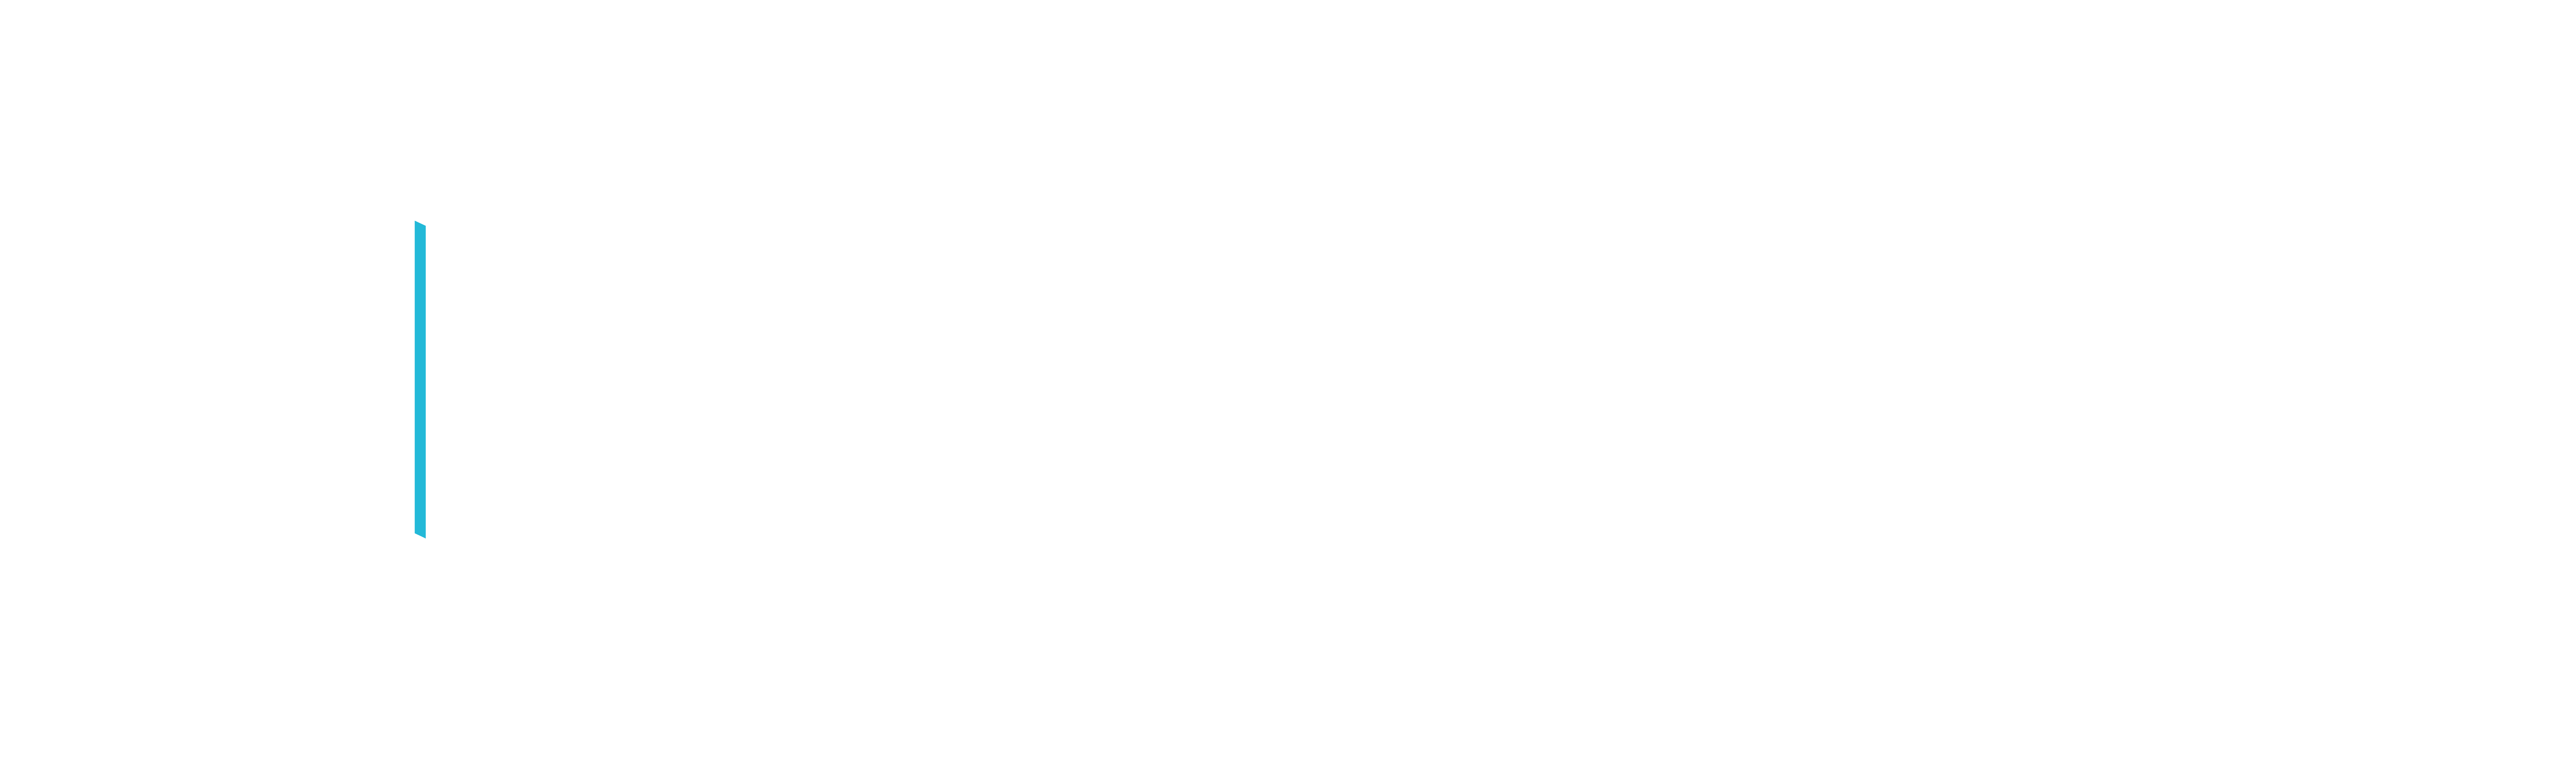 Music and Fine Arts Institute